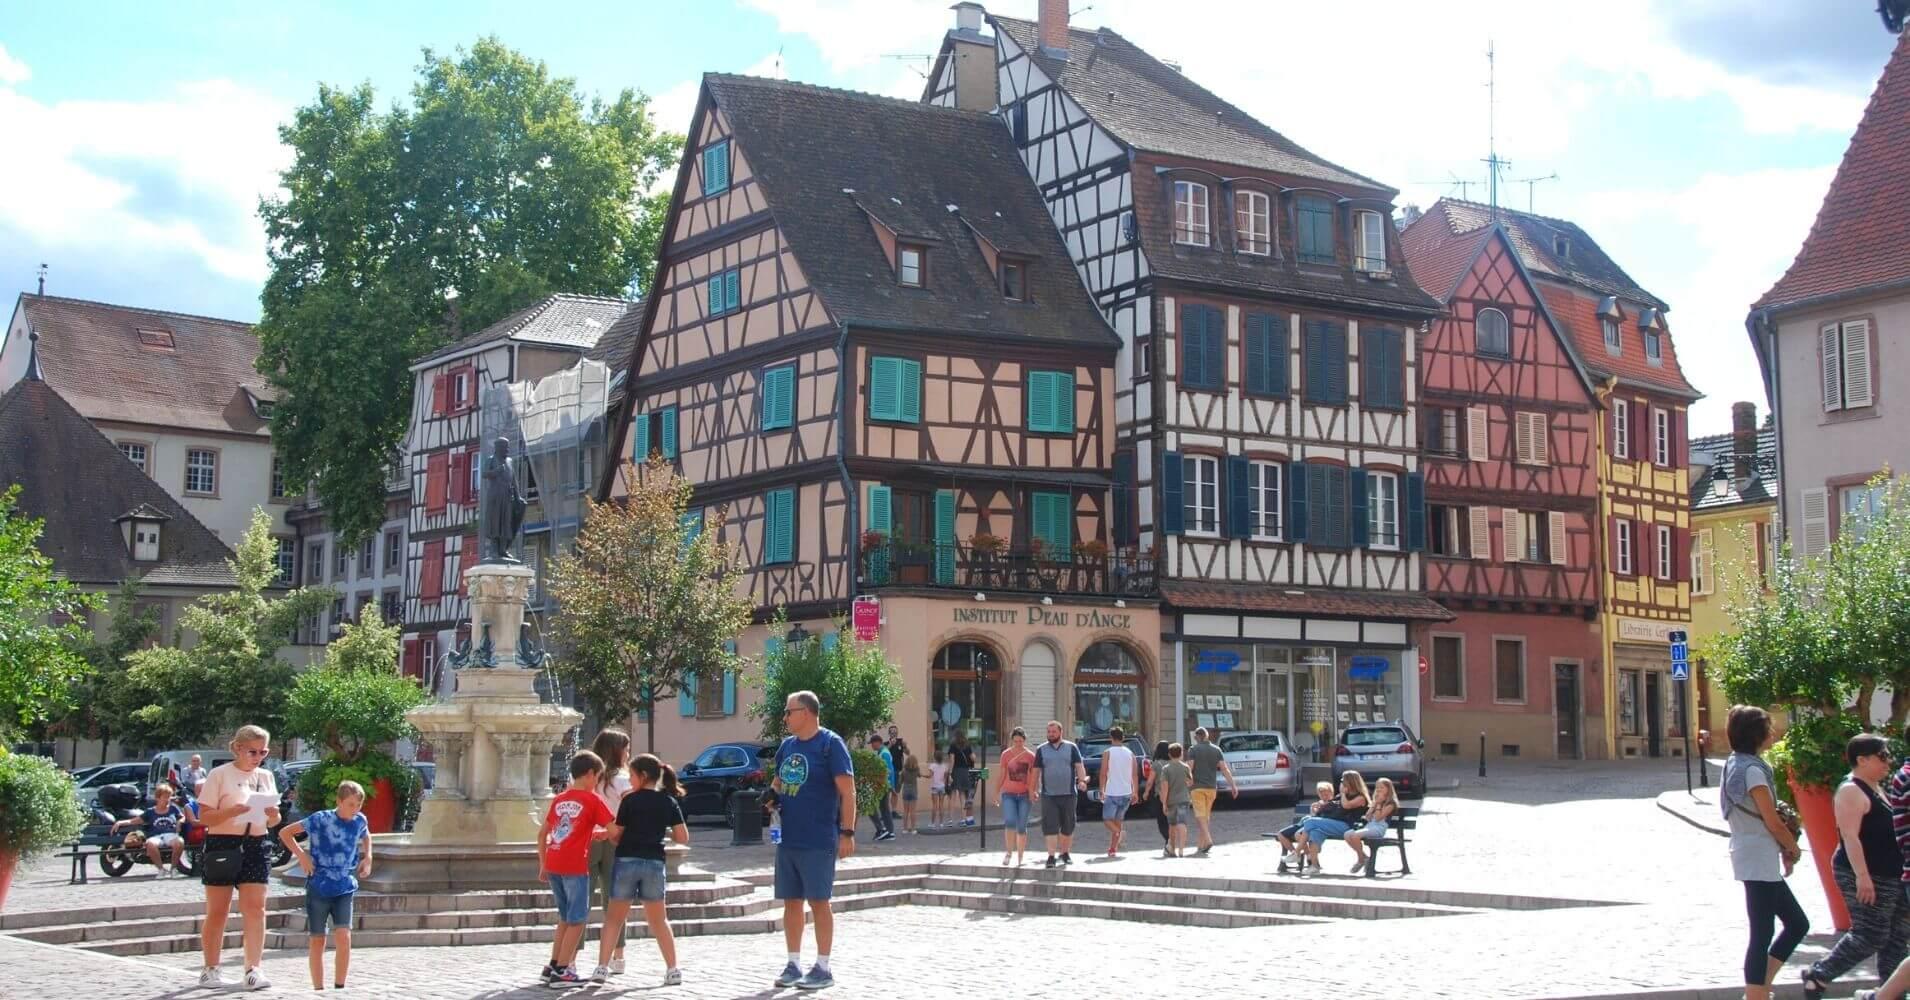 En Colmar. Alto Rin. Alsacia, Gran Este. Francia.